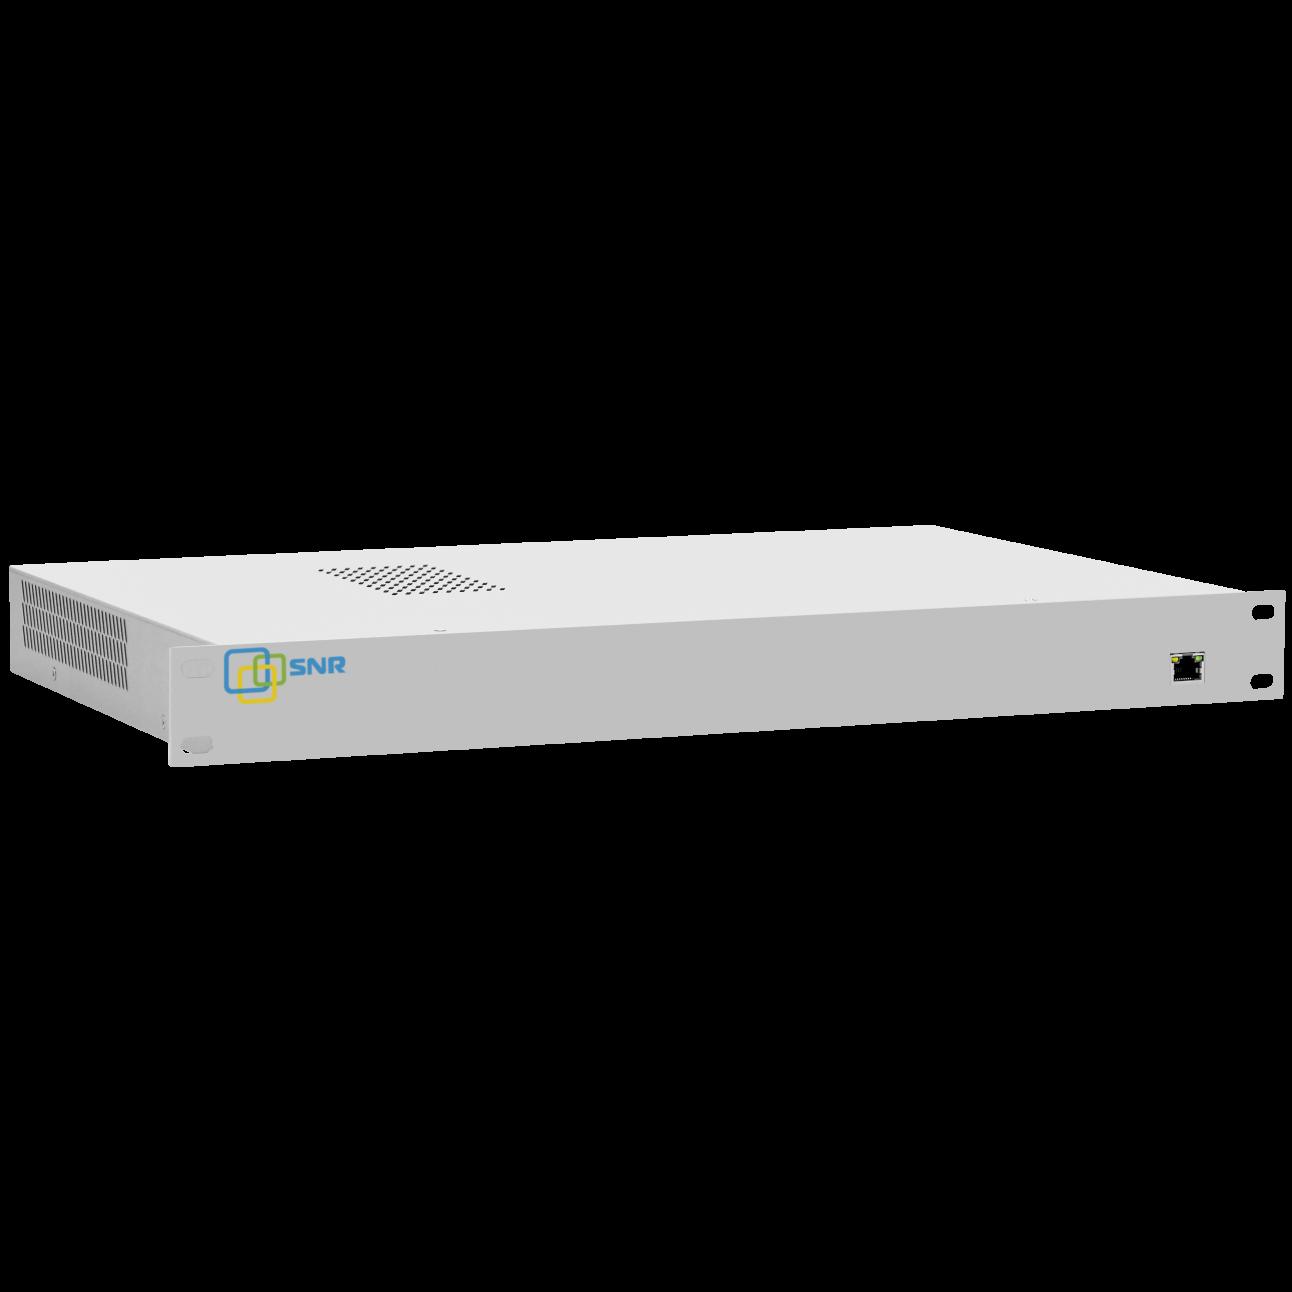 16 канальный DVB-C Модулятор SNR IPQAM-16